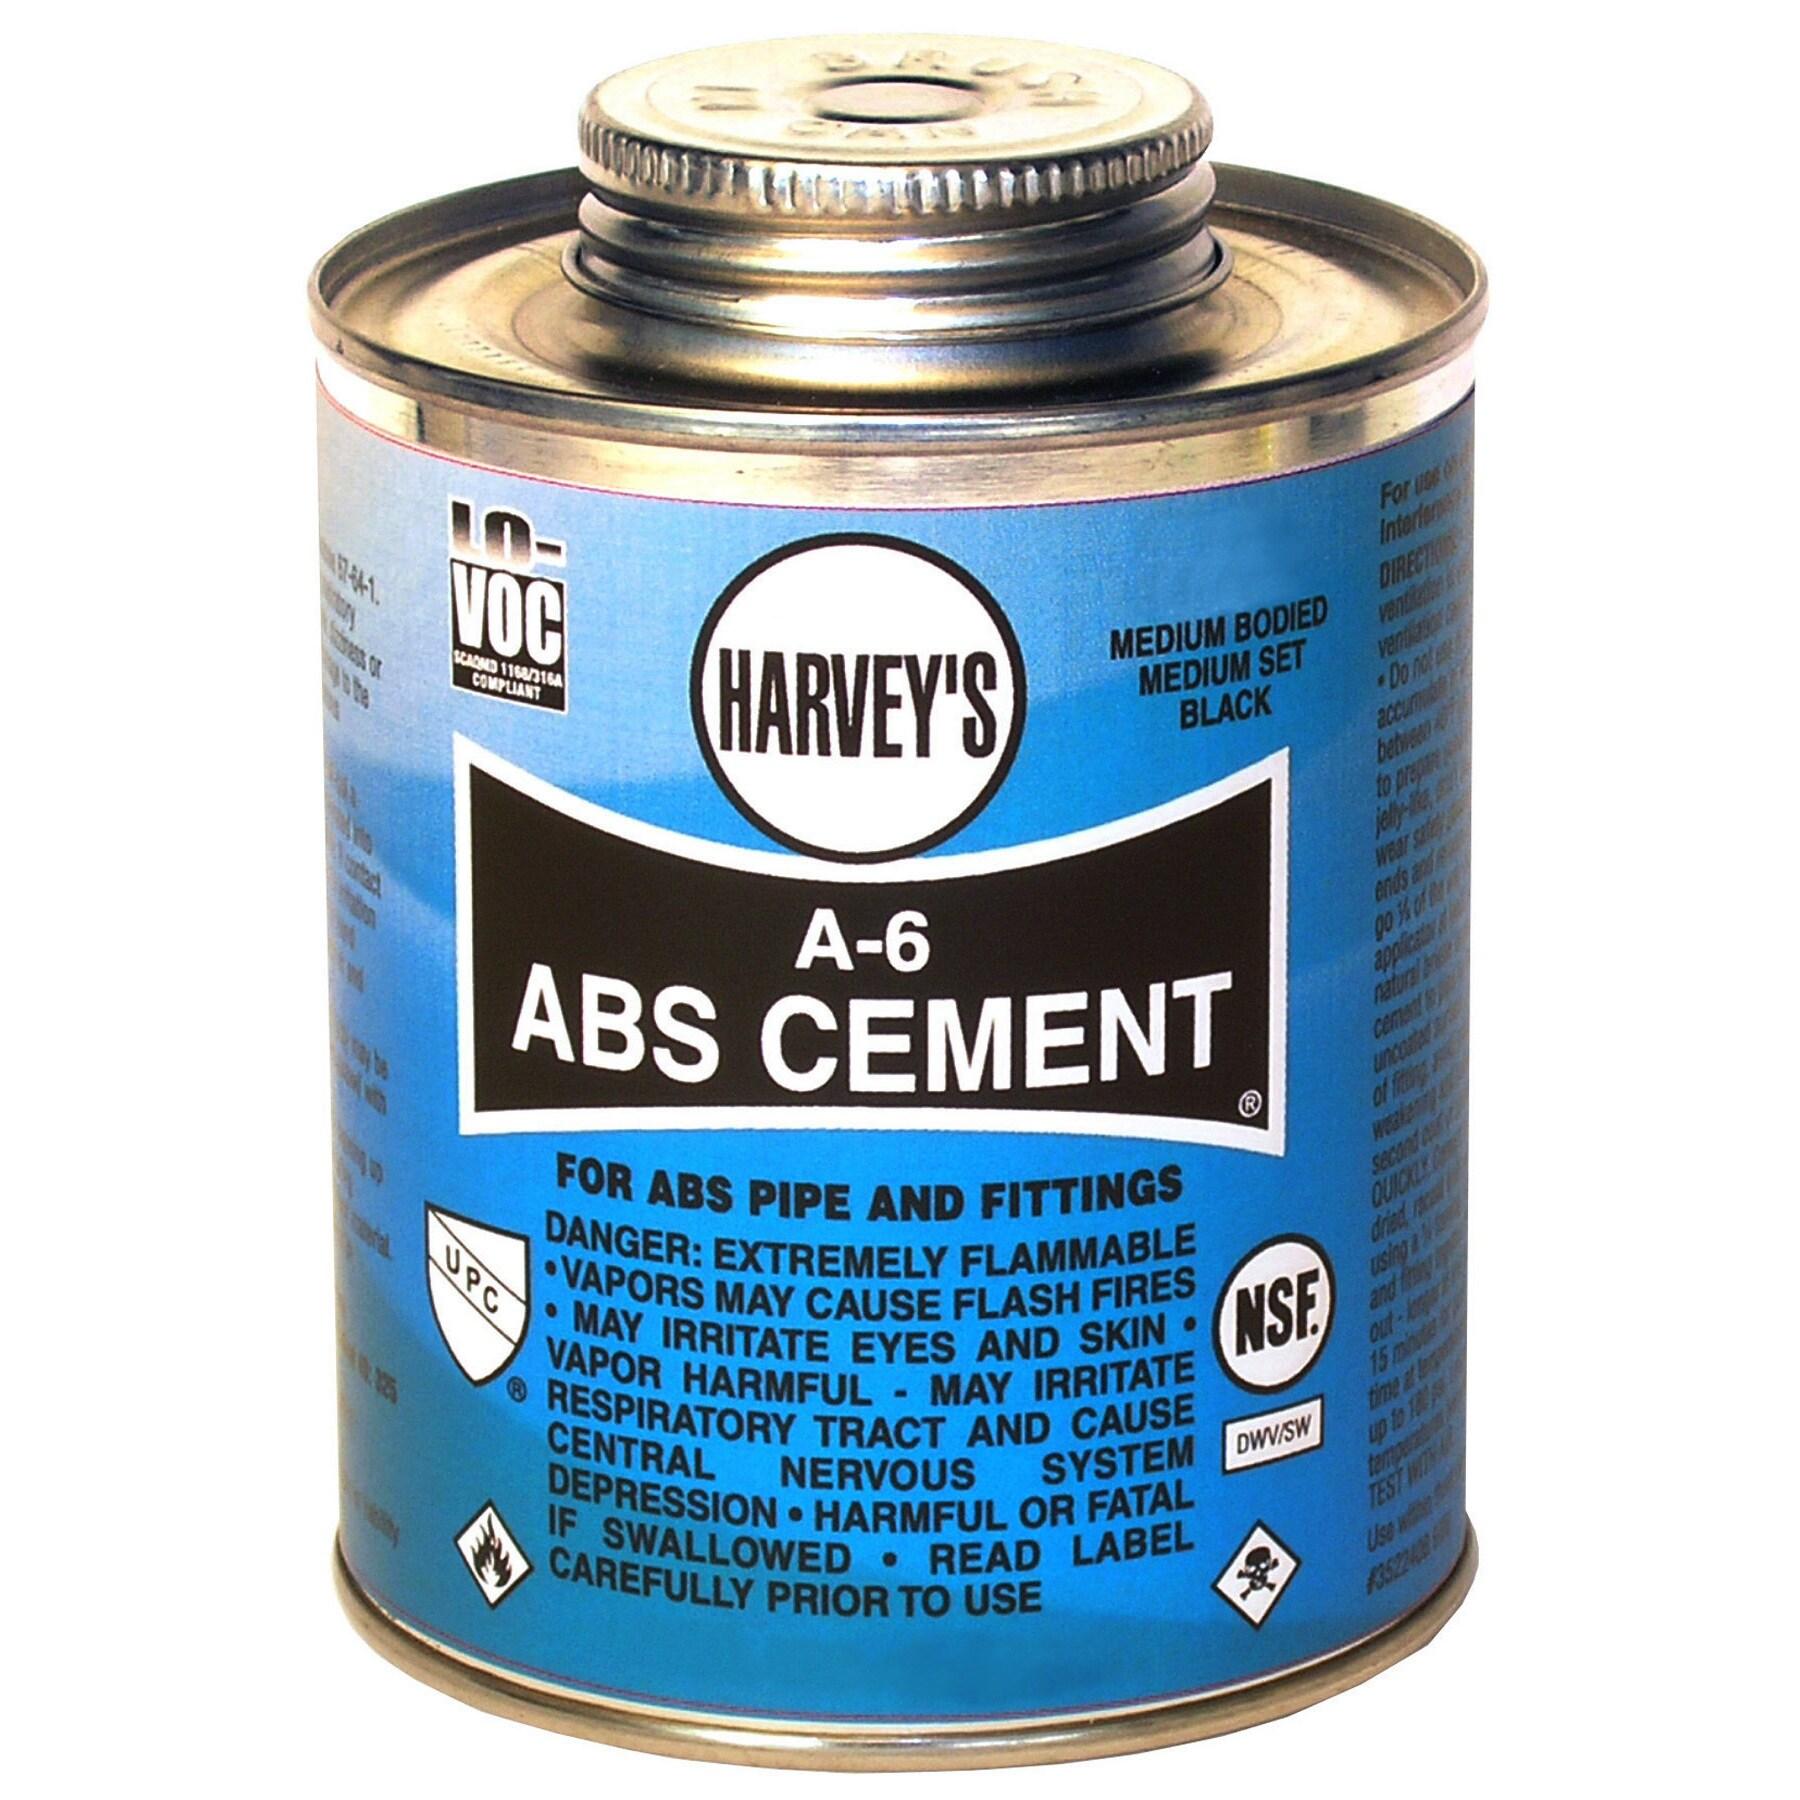 WM Harvey 018510-24 1/2 Pint Black A-6 Medium Bodied ABS ...